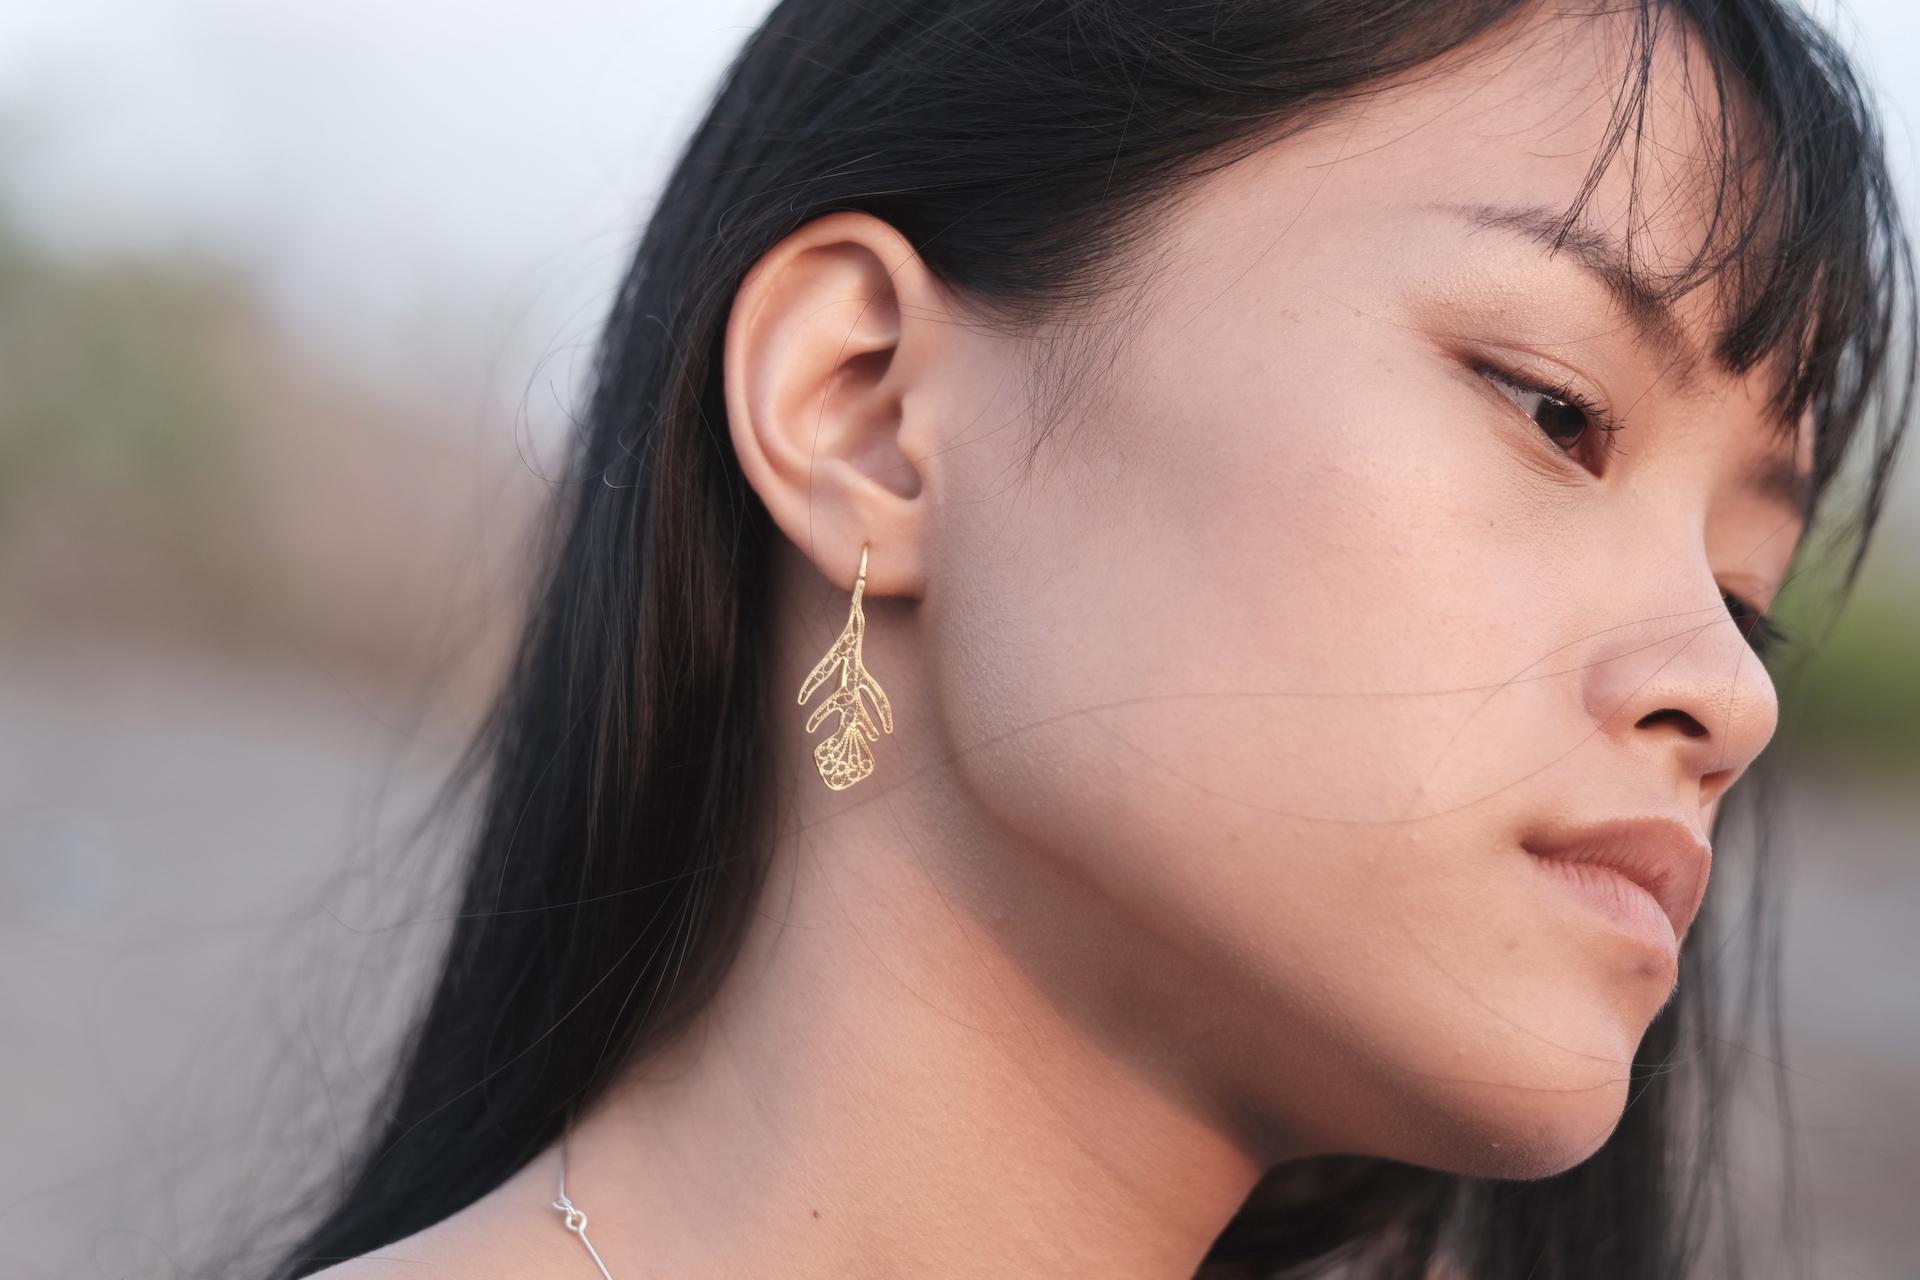 Nazuna(薺) - Earrings / Gold